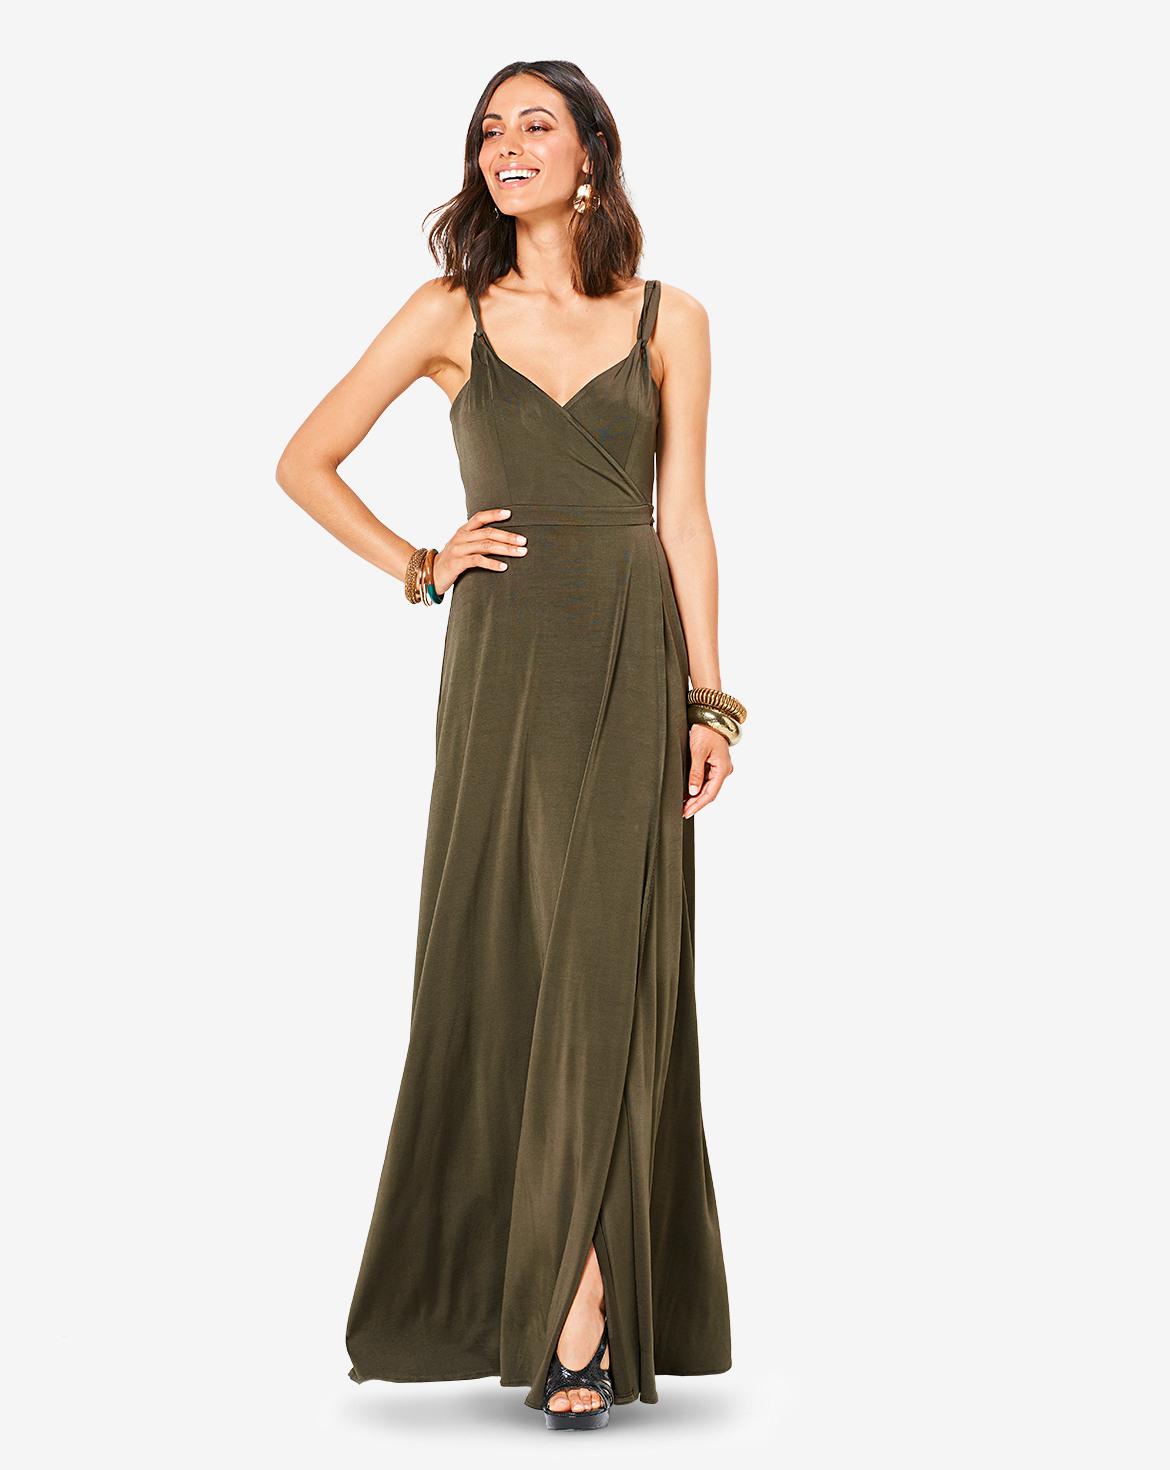 Genial Burda Abendkleid Boutique13 Luxurius Burda Abendkleid Spezialgebiet